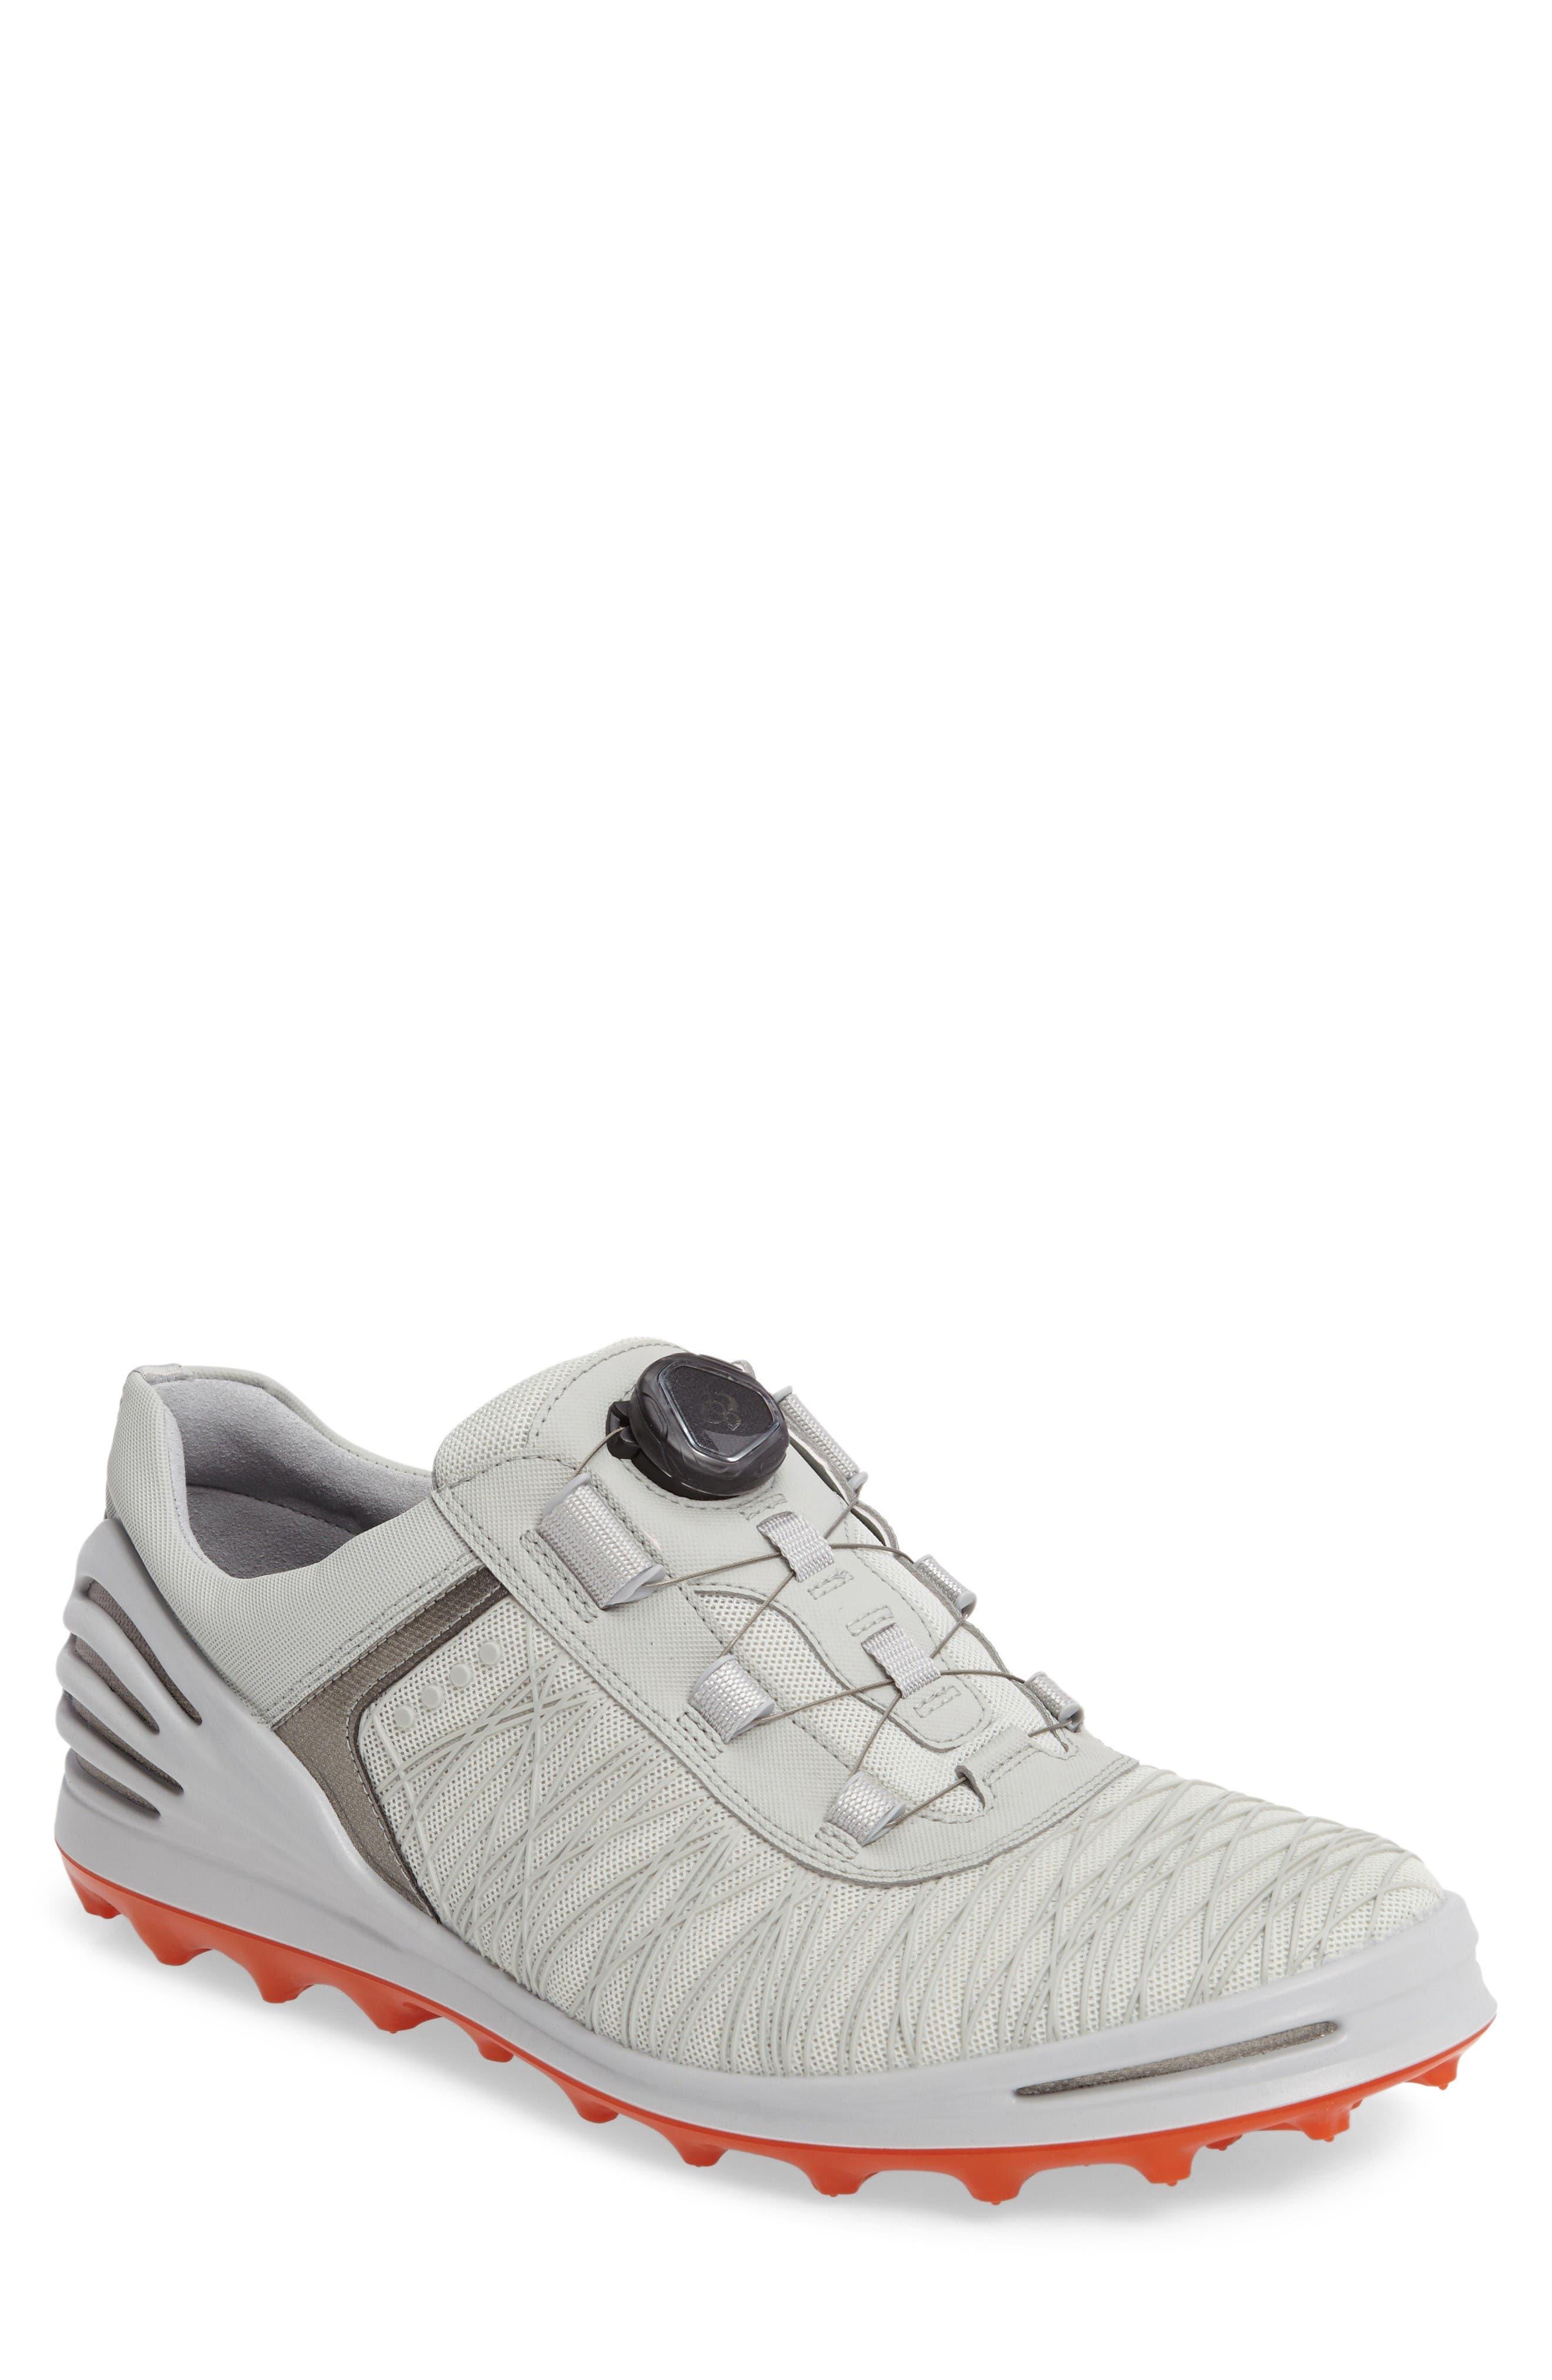 6fe11b66a27f ecco wingtip golf shoes for sale   OFF69% Discounts